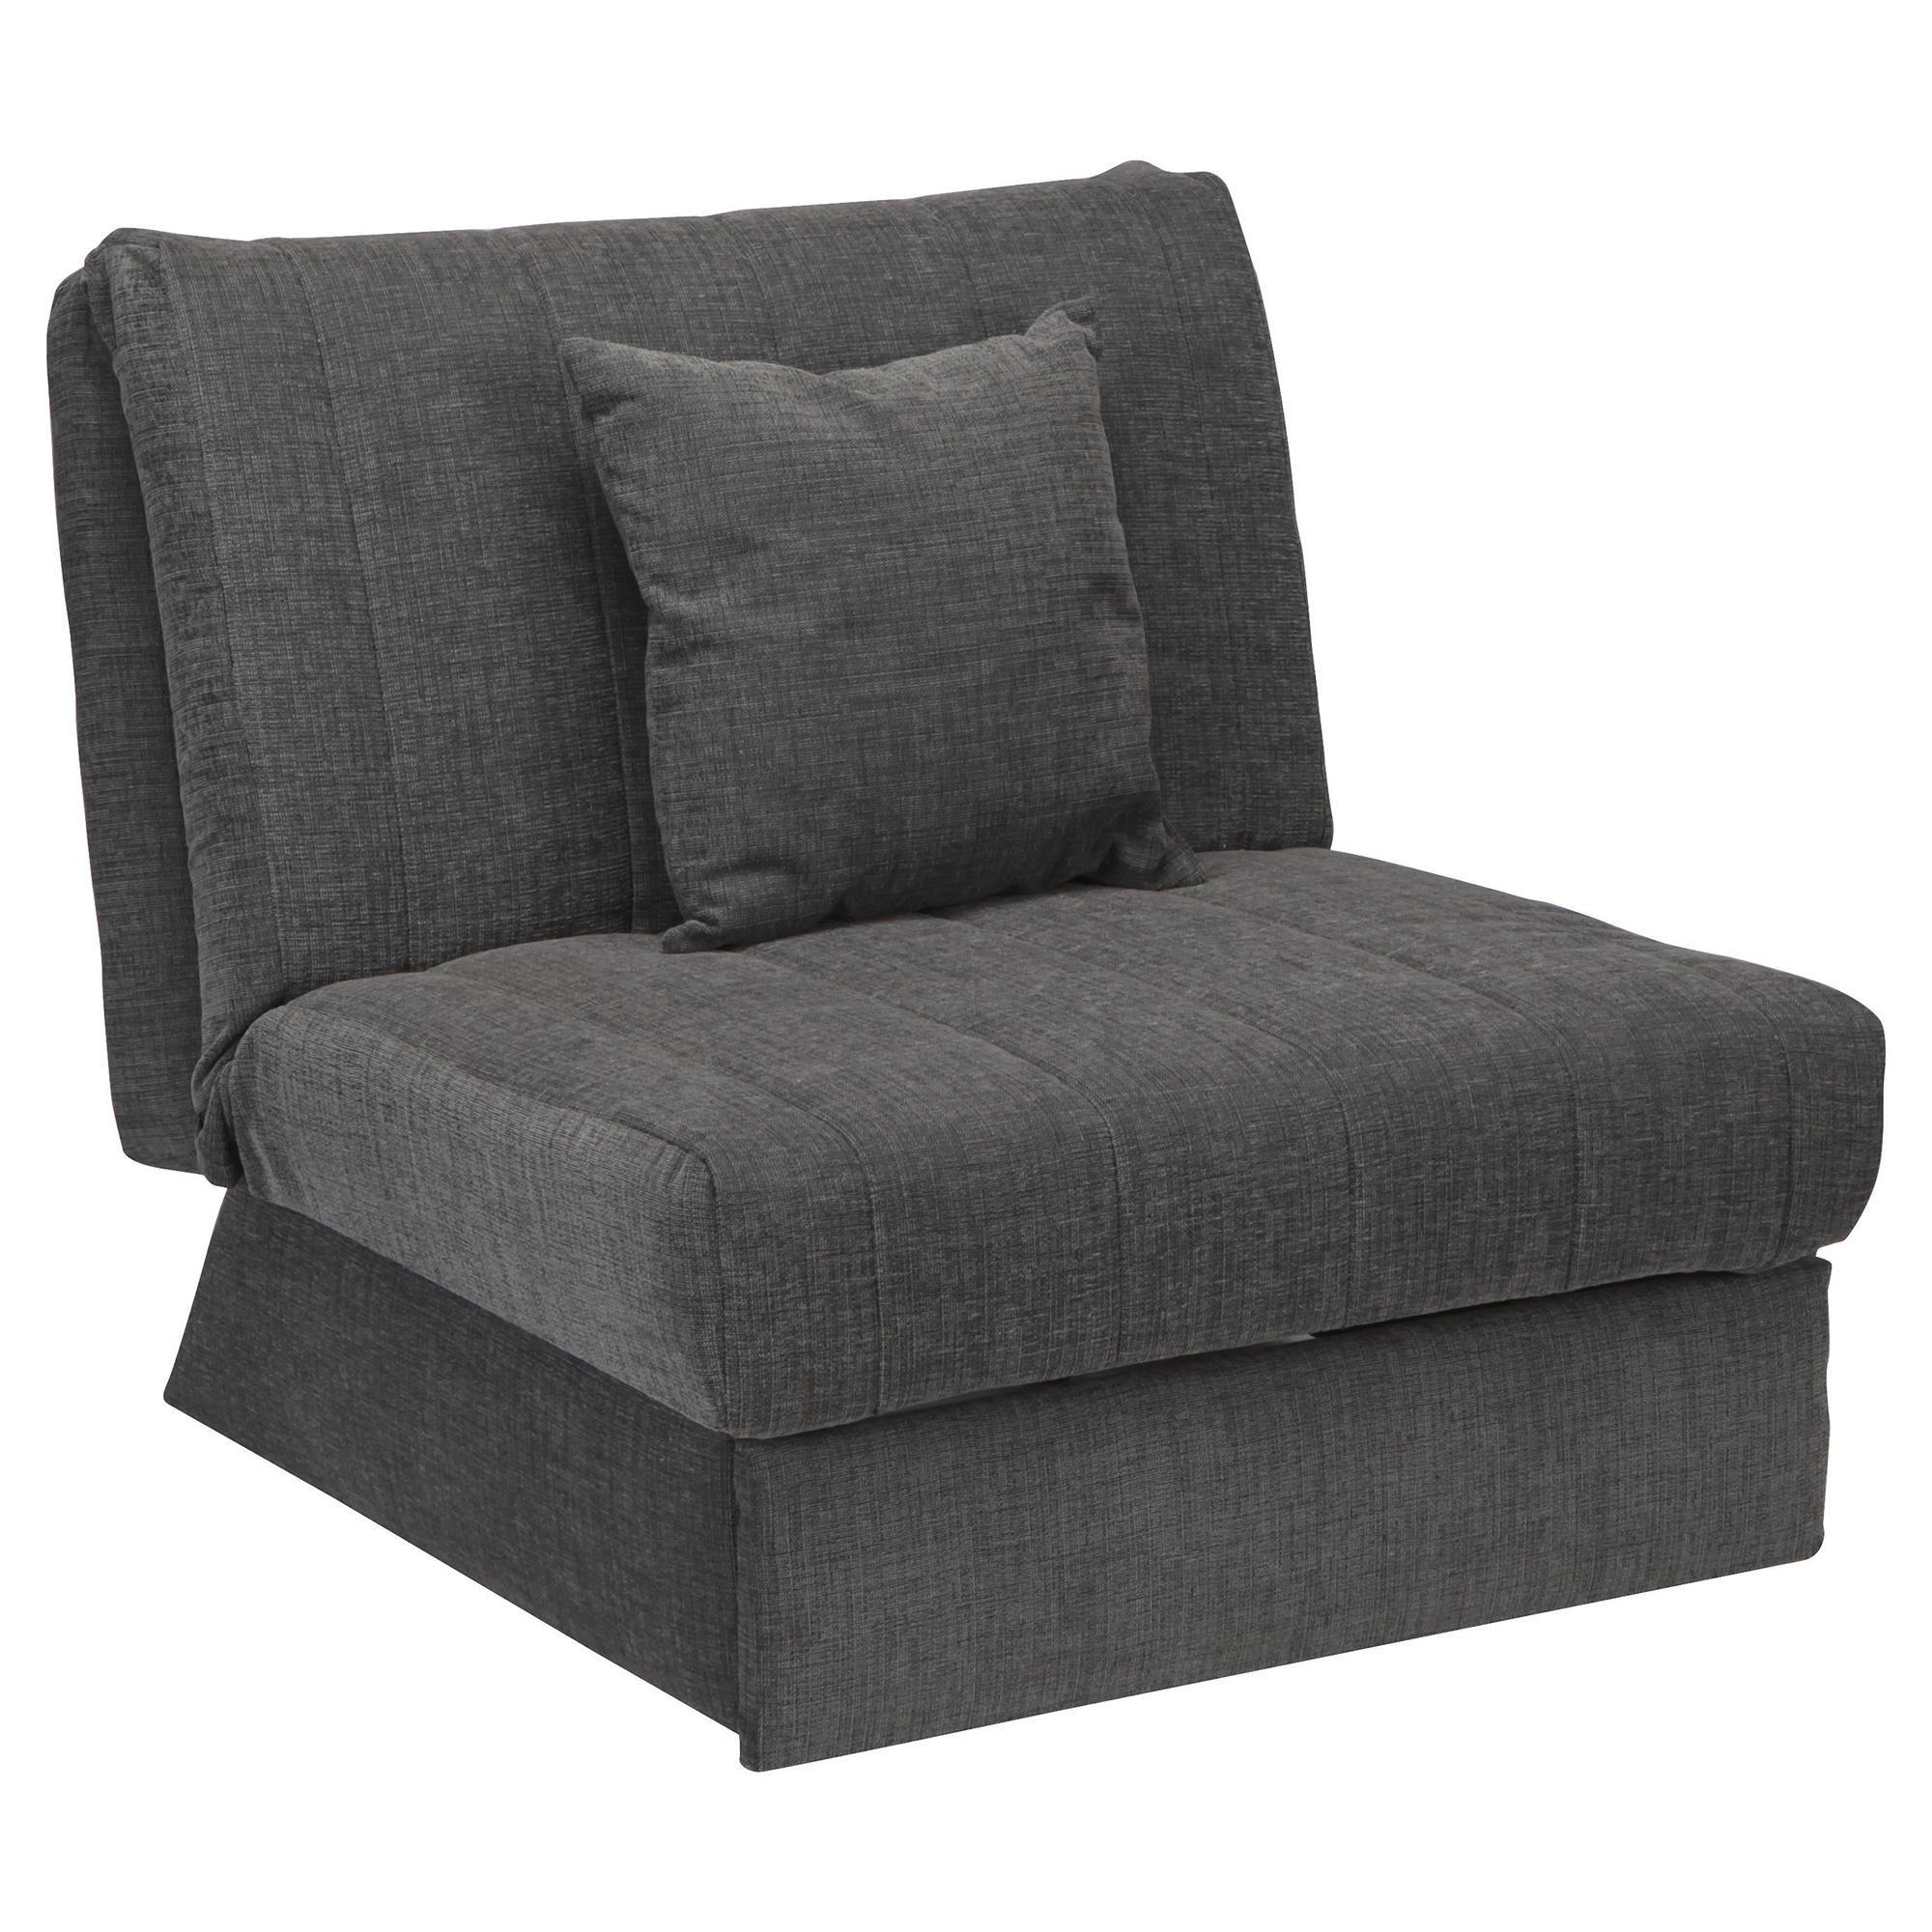 Morton Fabric Single Sofa Bed Charcoal at Tesco Direct